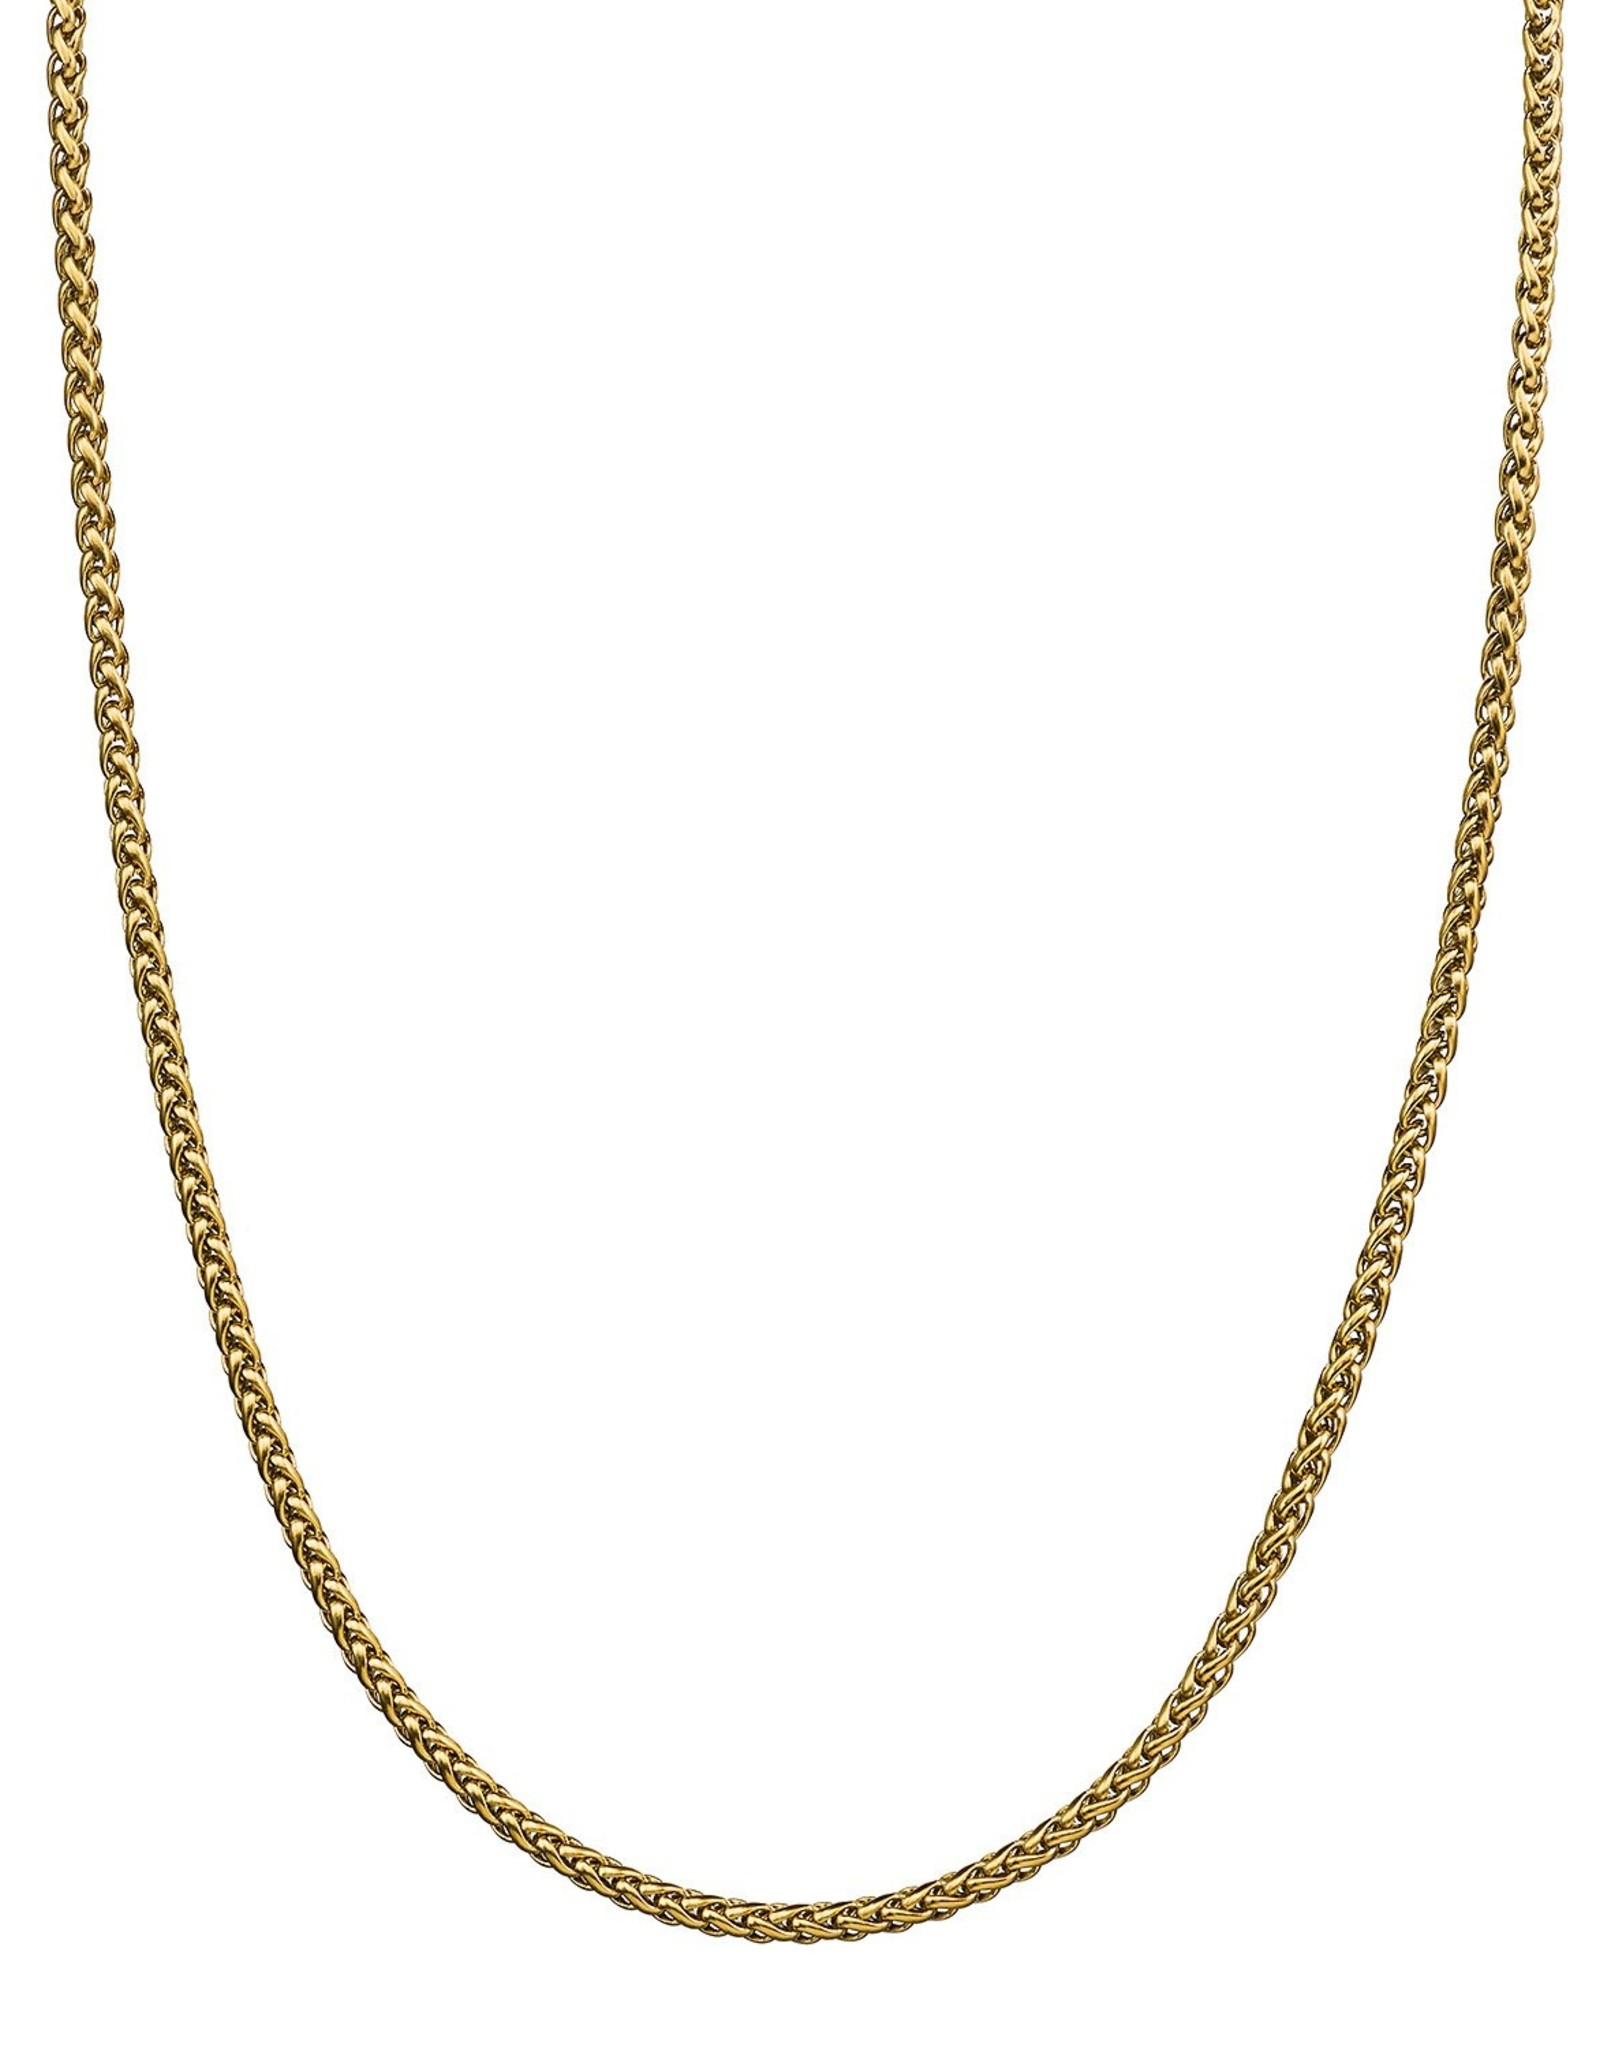 Croyez Chain wheat 3mm 14k gold 55cm